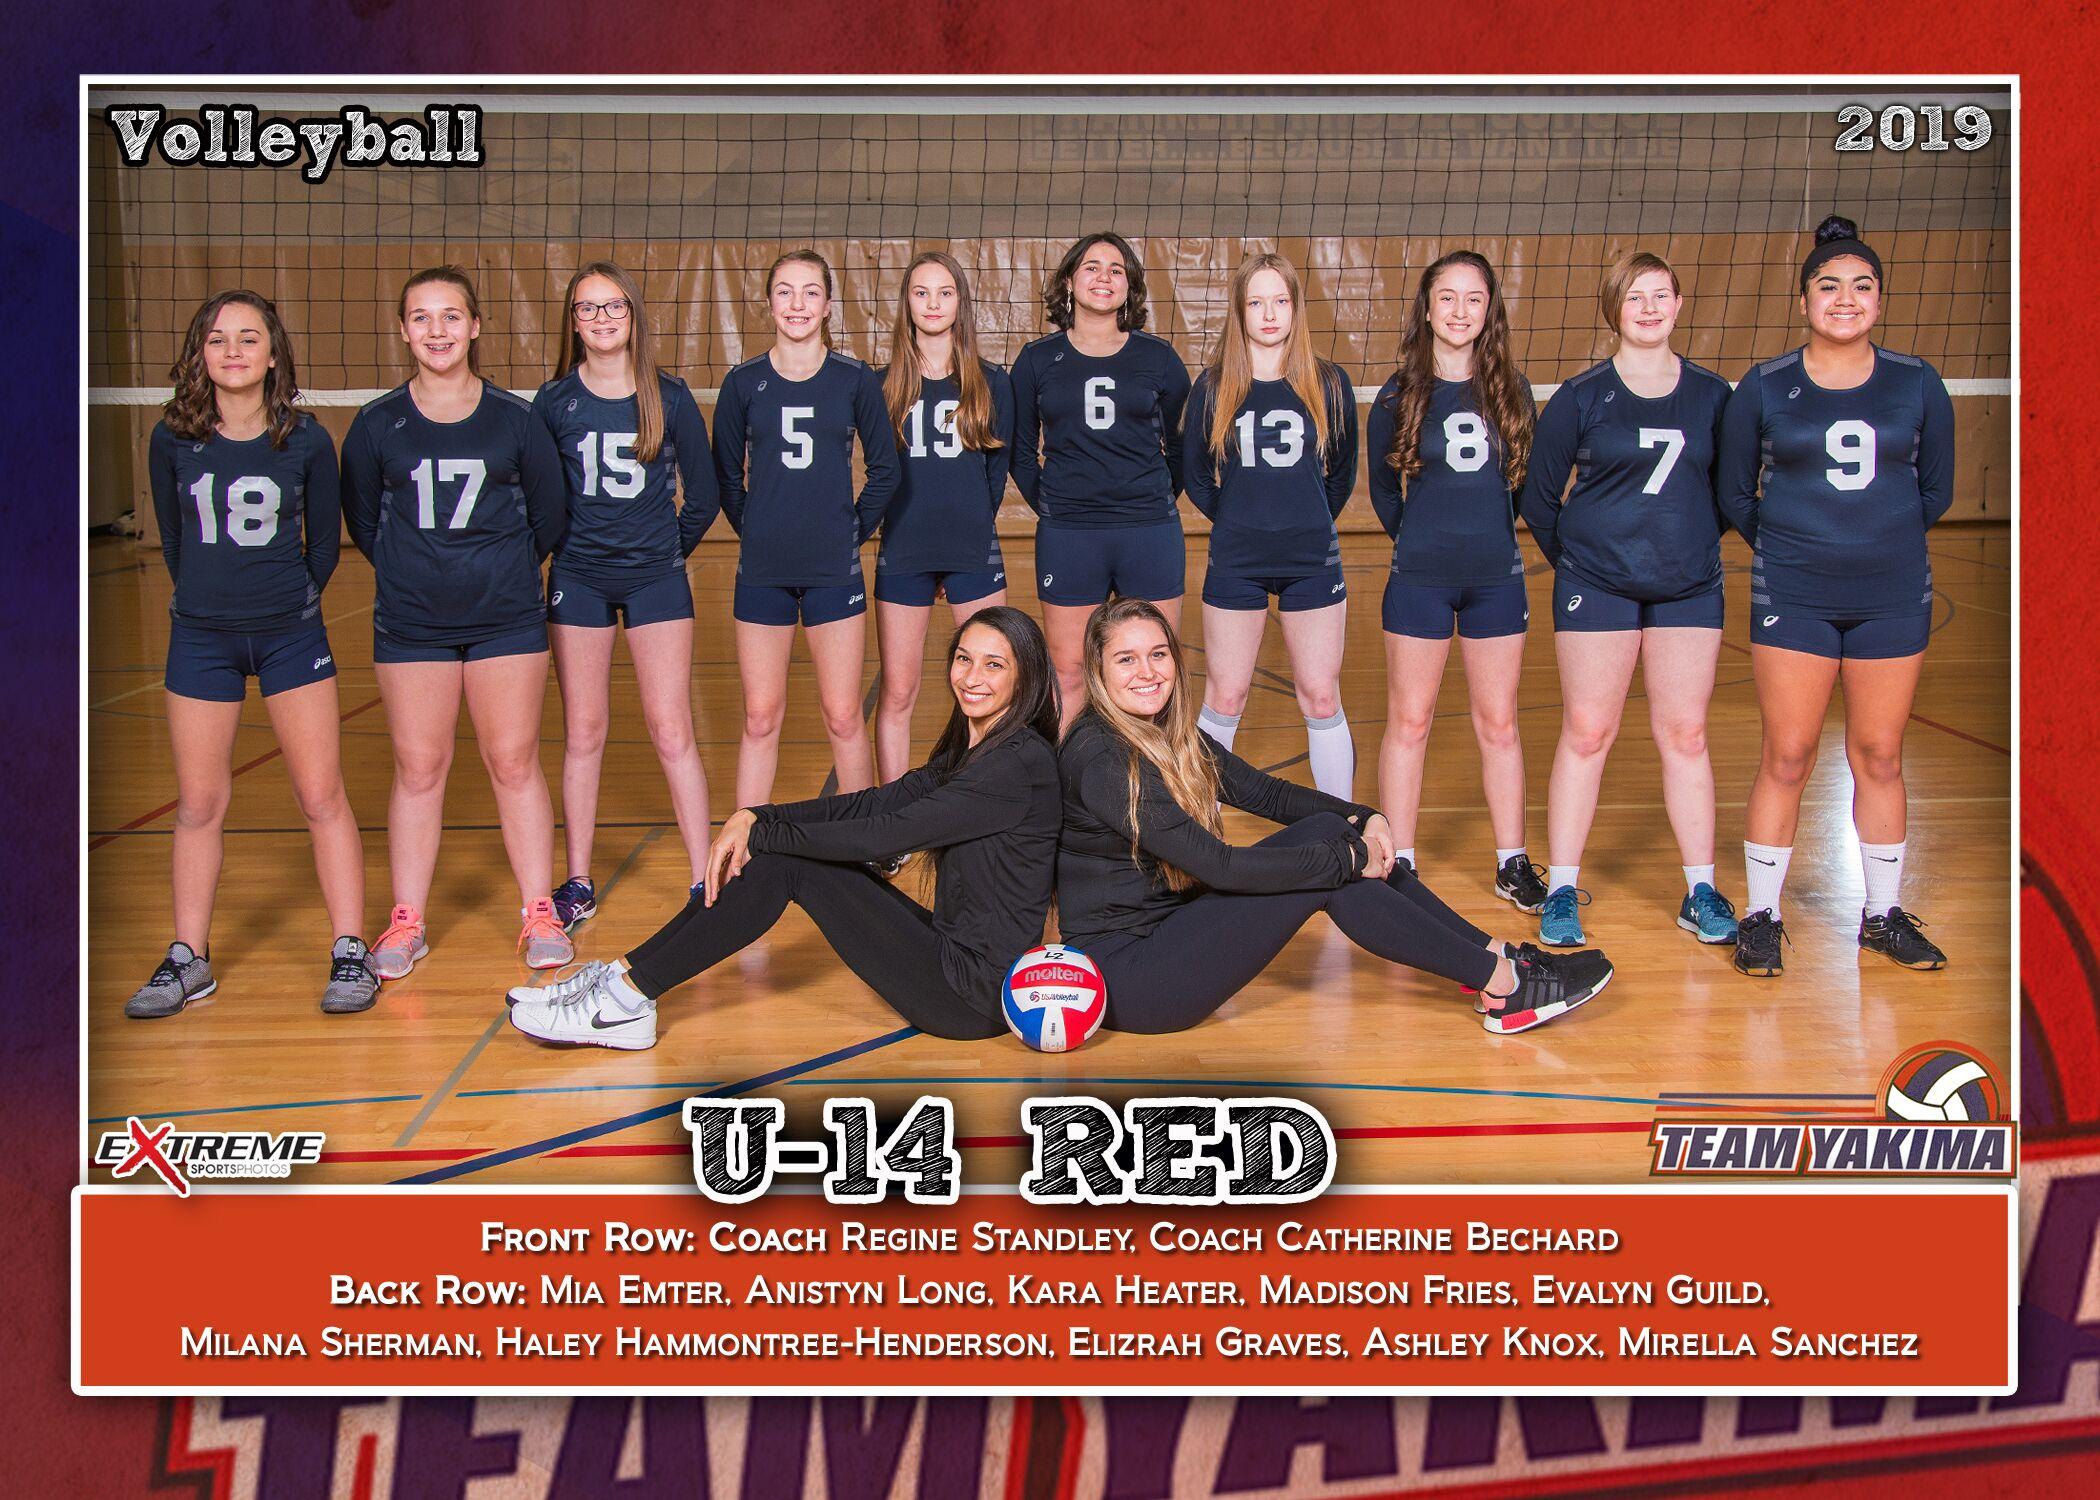 Team Yakima 14 Red